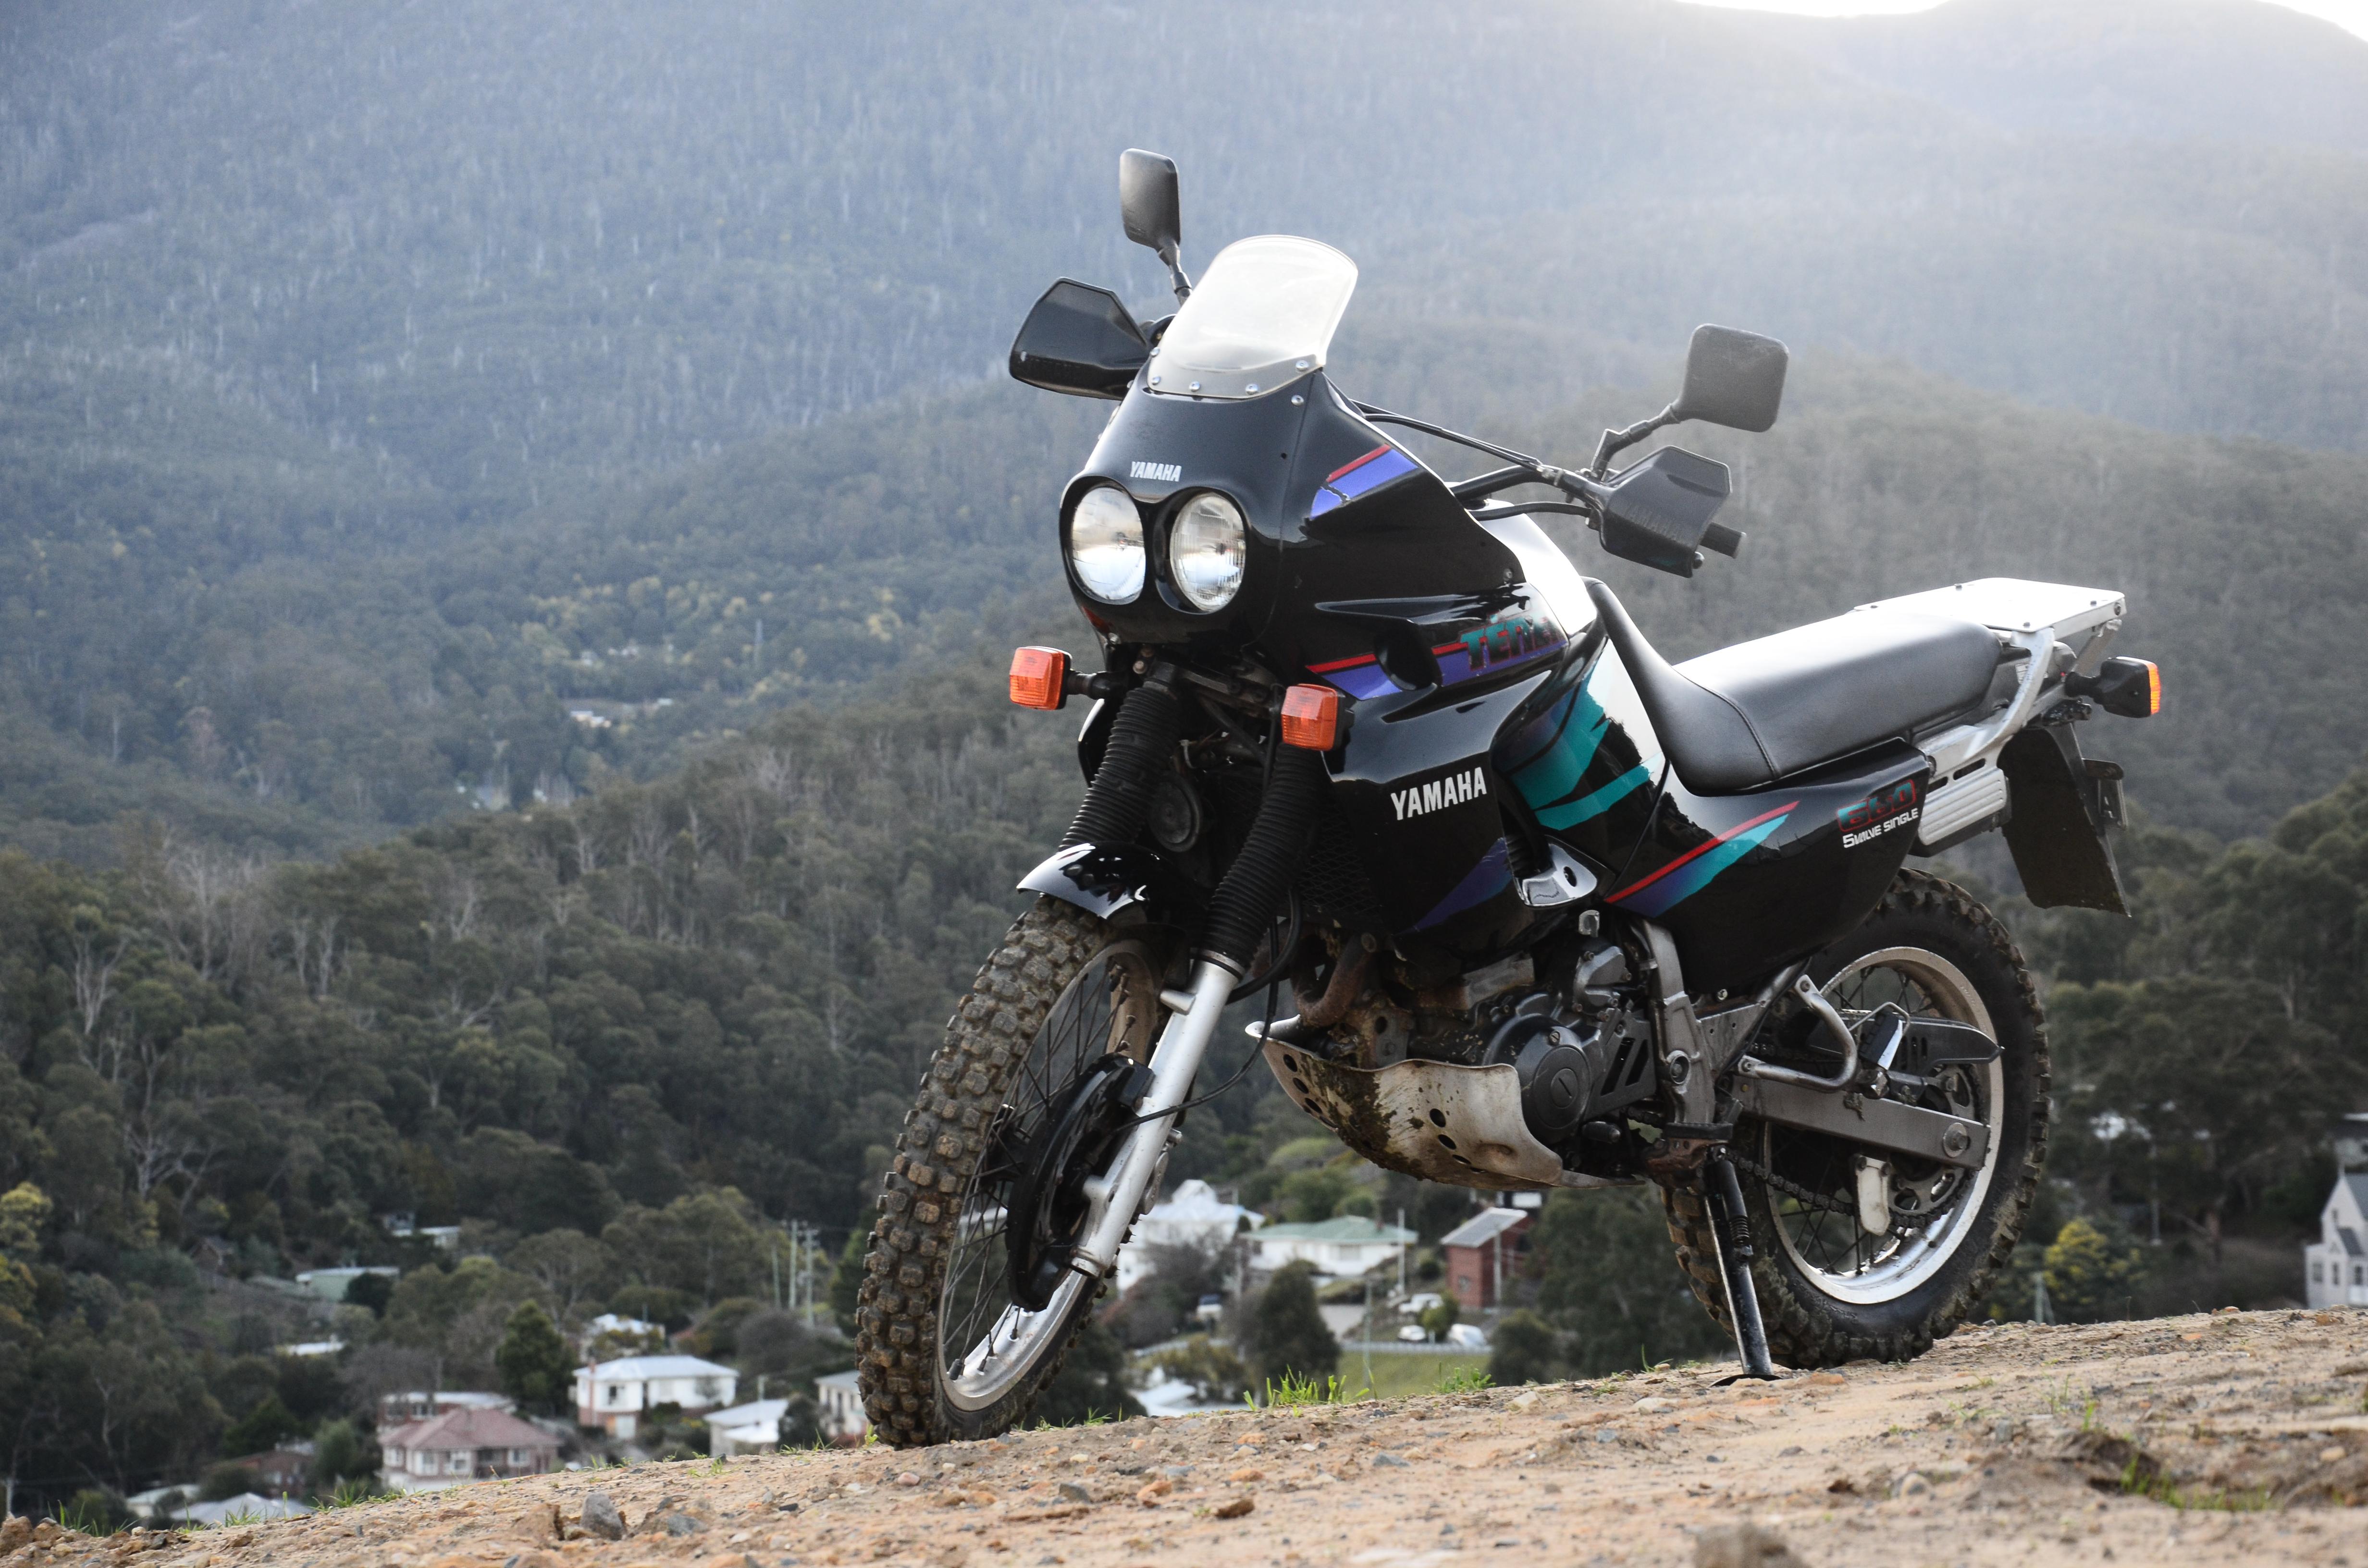 Yamaha Super Tenere Parts